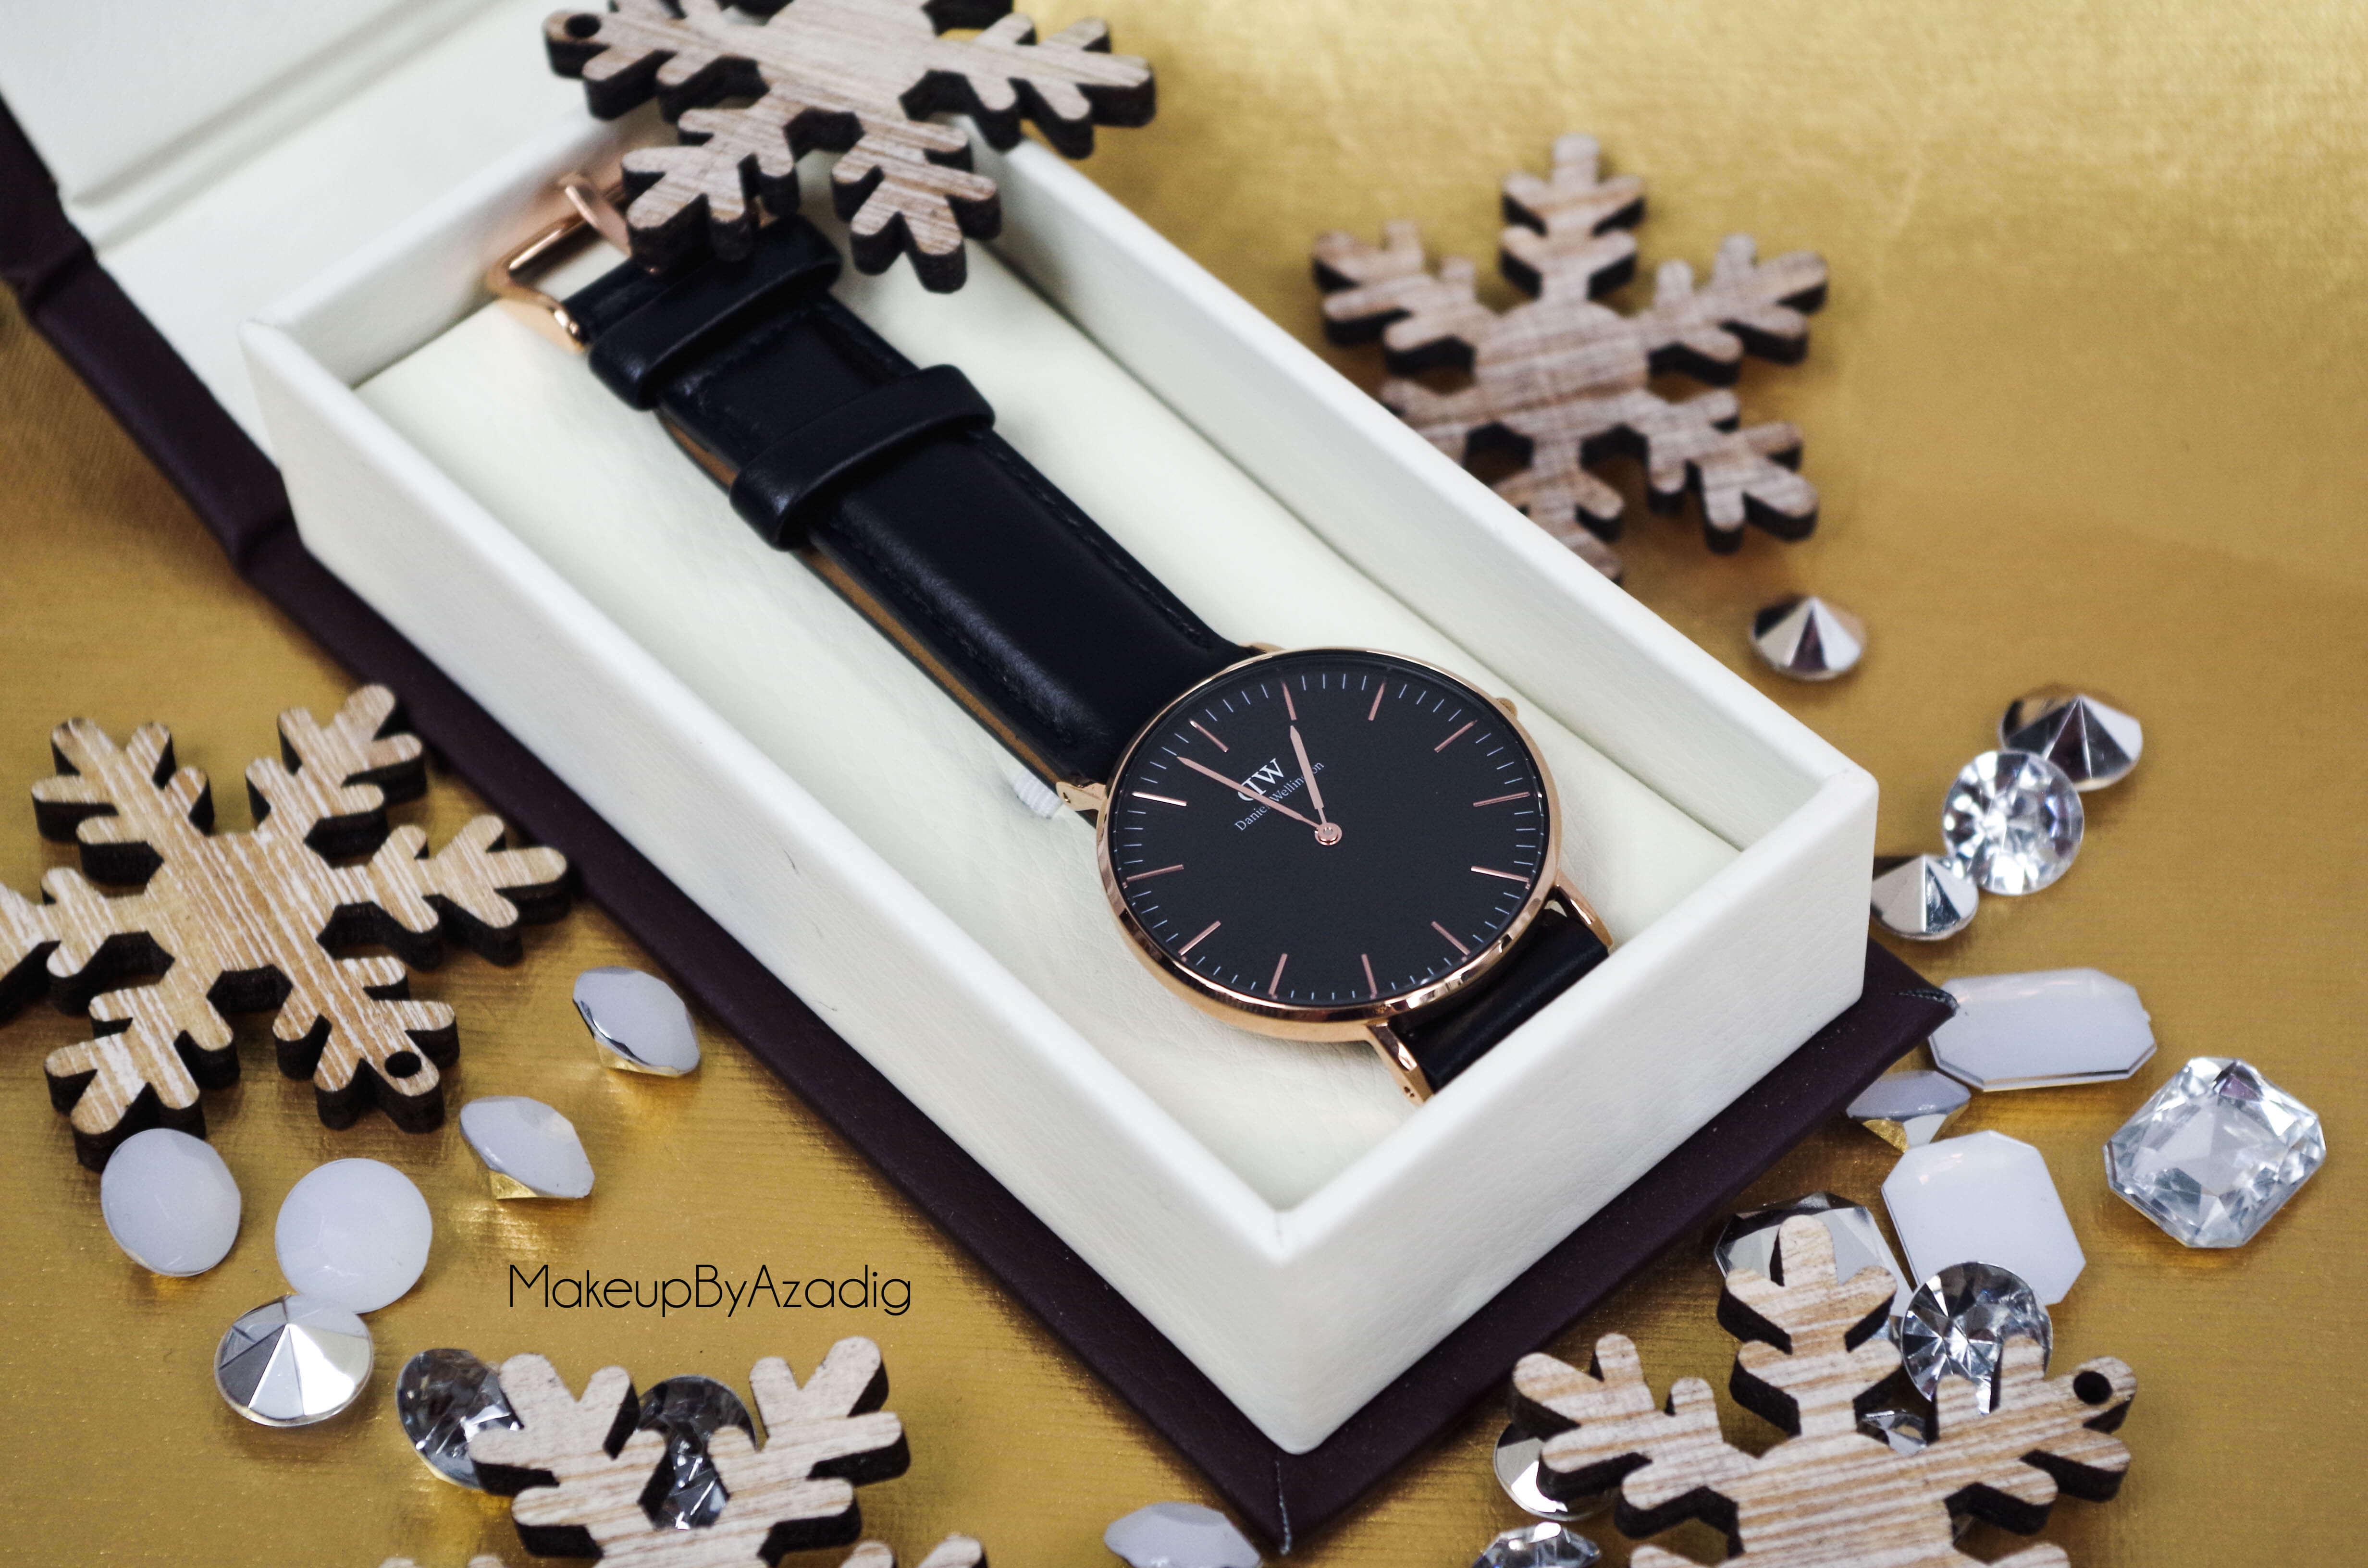 makeupbyazadig-daniel-wellington-montre-classic-black-sheffield-code-promo-troyes-paris-rose